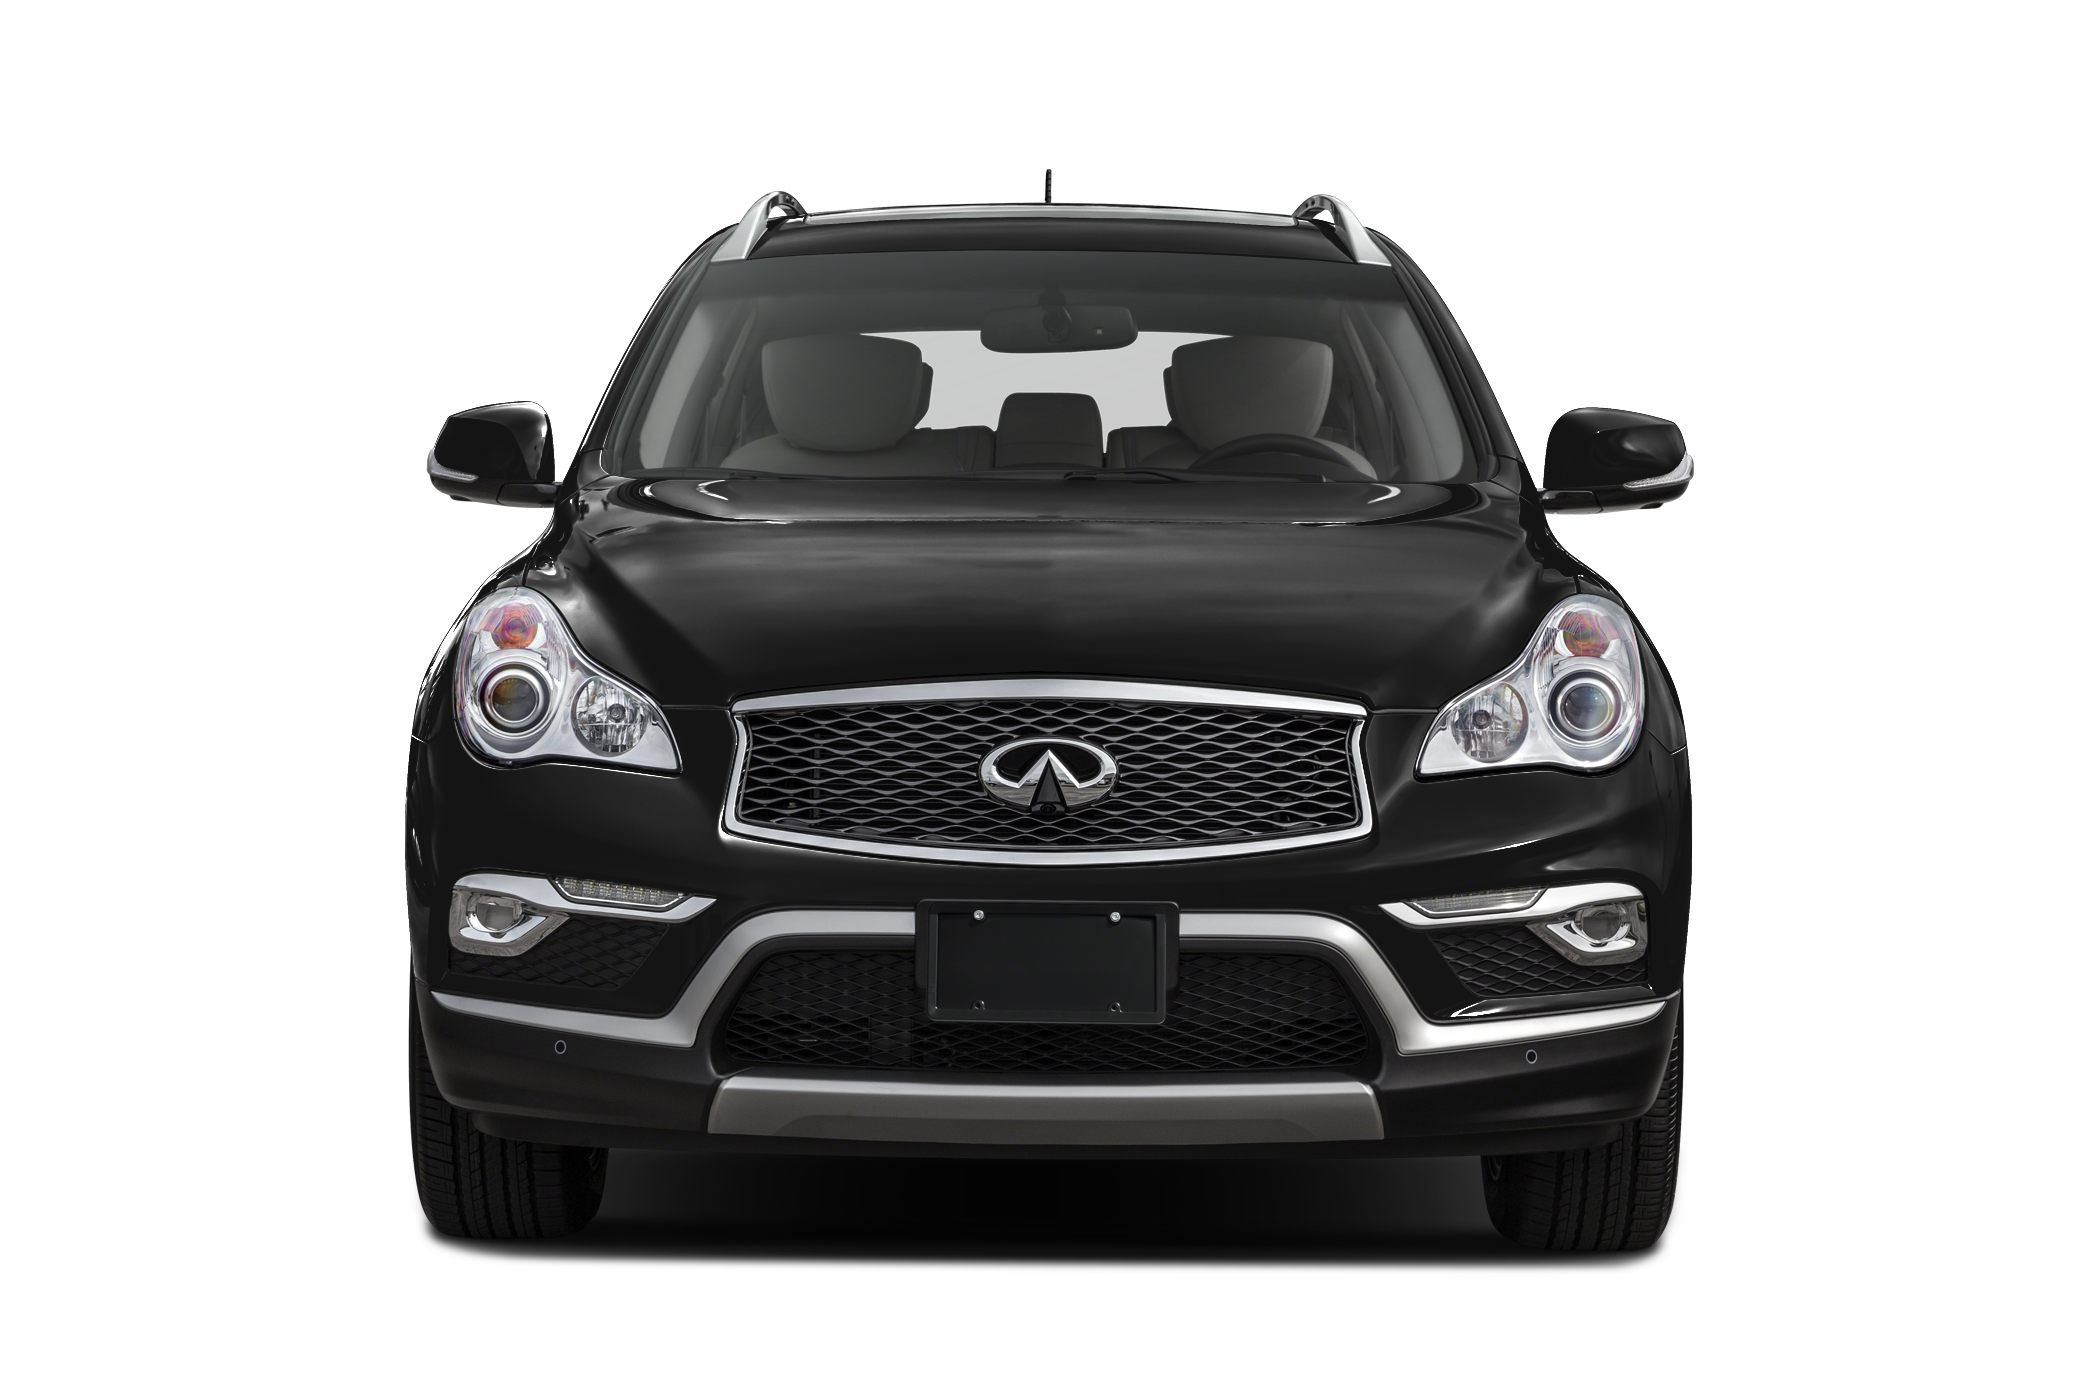 Infiniti Dealership Milwaukee >> Car Dealers Find New Car Dealers Listings And Contact .html | Autos Weblog